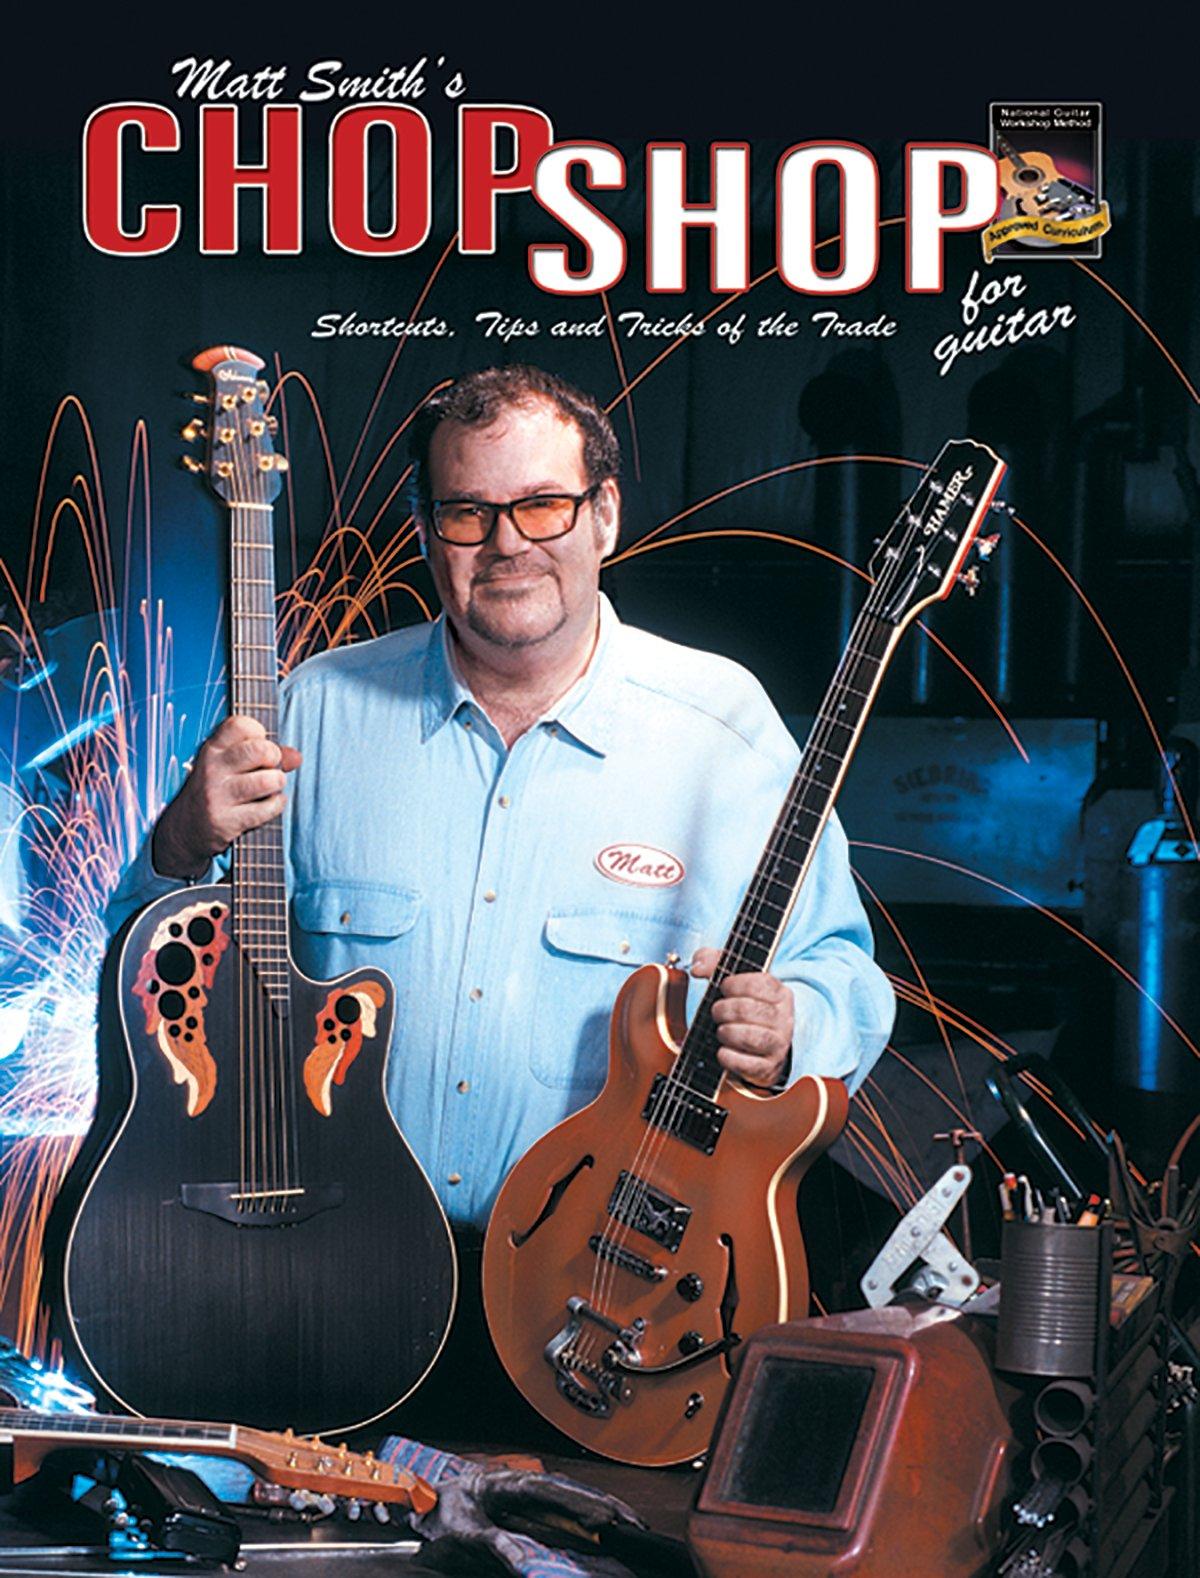 Matt Smith's Chop Shop for Guitar: Shortcuts, Tips, and Tricks of the Trade  (Book & CD): Matt Smith: 0630746710330: Amazon.com: Books